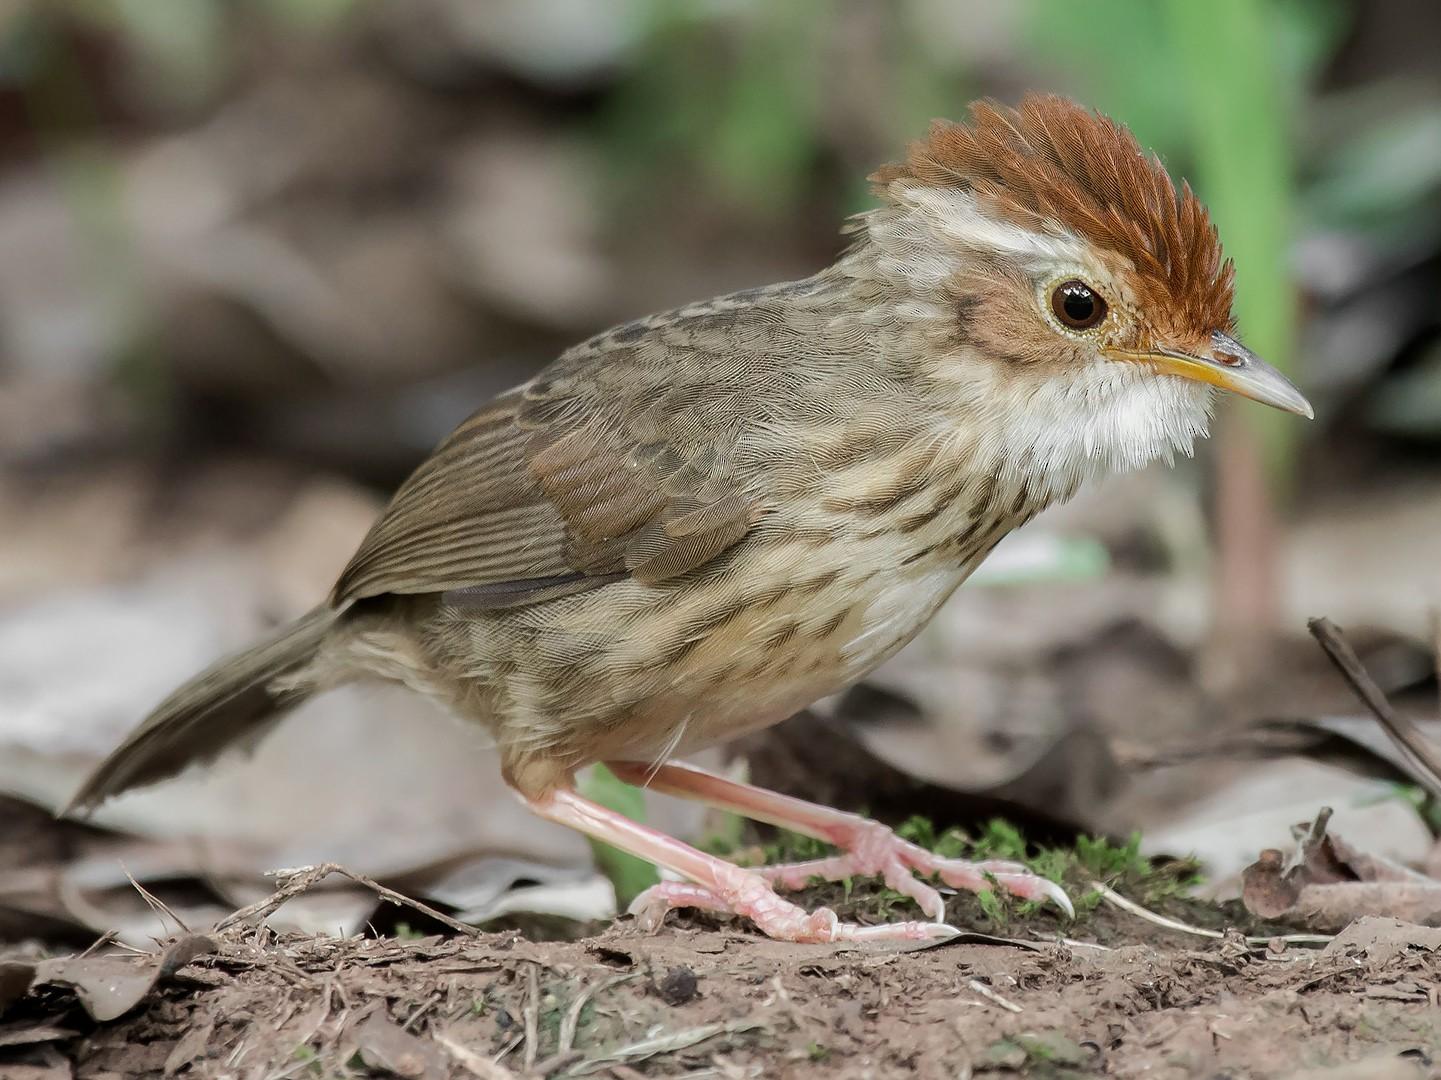 Puff-throated Babbler - Natthaphat Chotjuckdikul